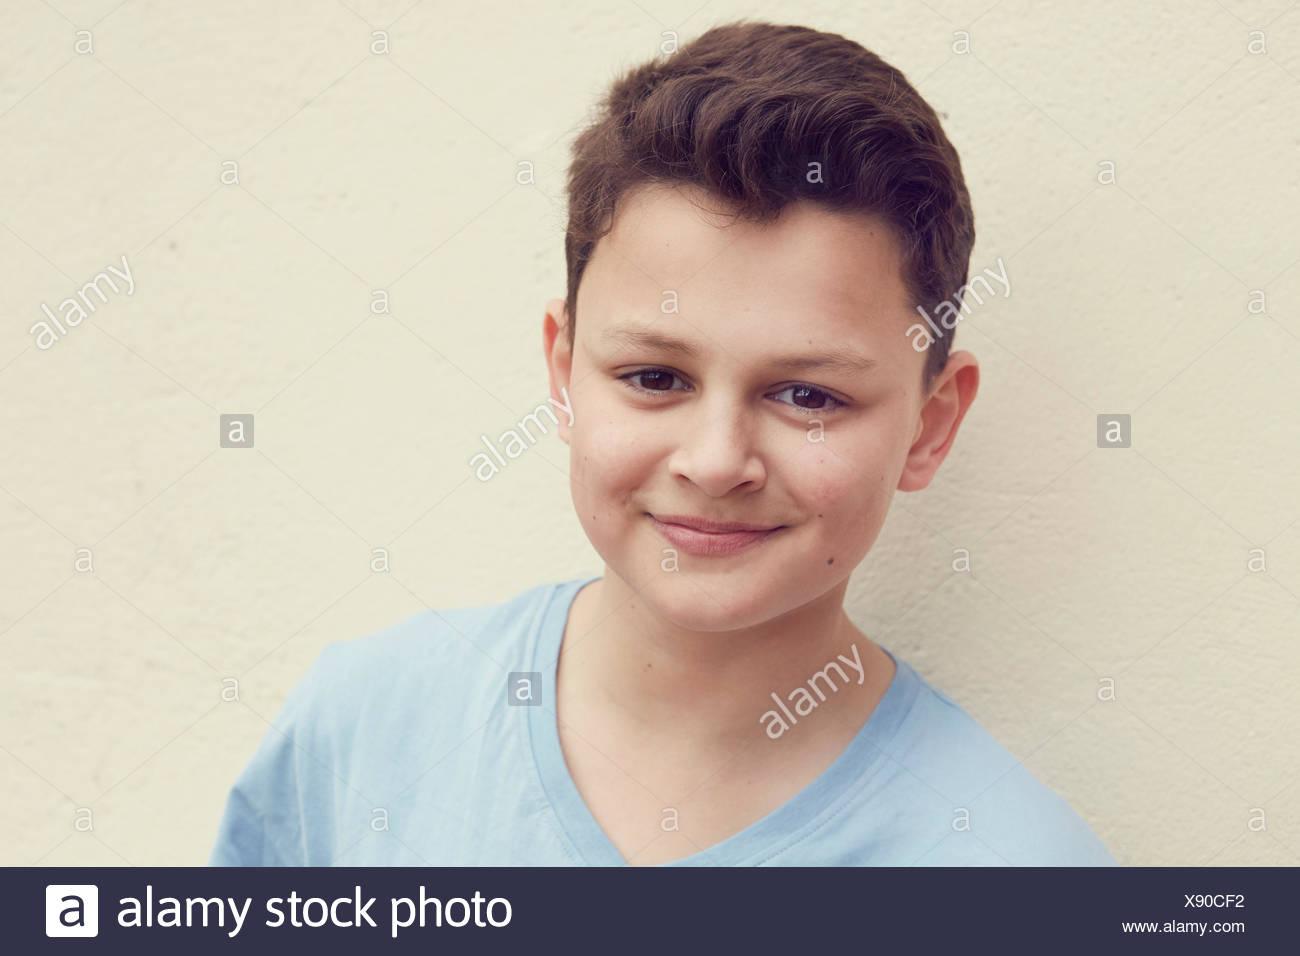 Retrato de niño en frente de pared Imagen De Stock